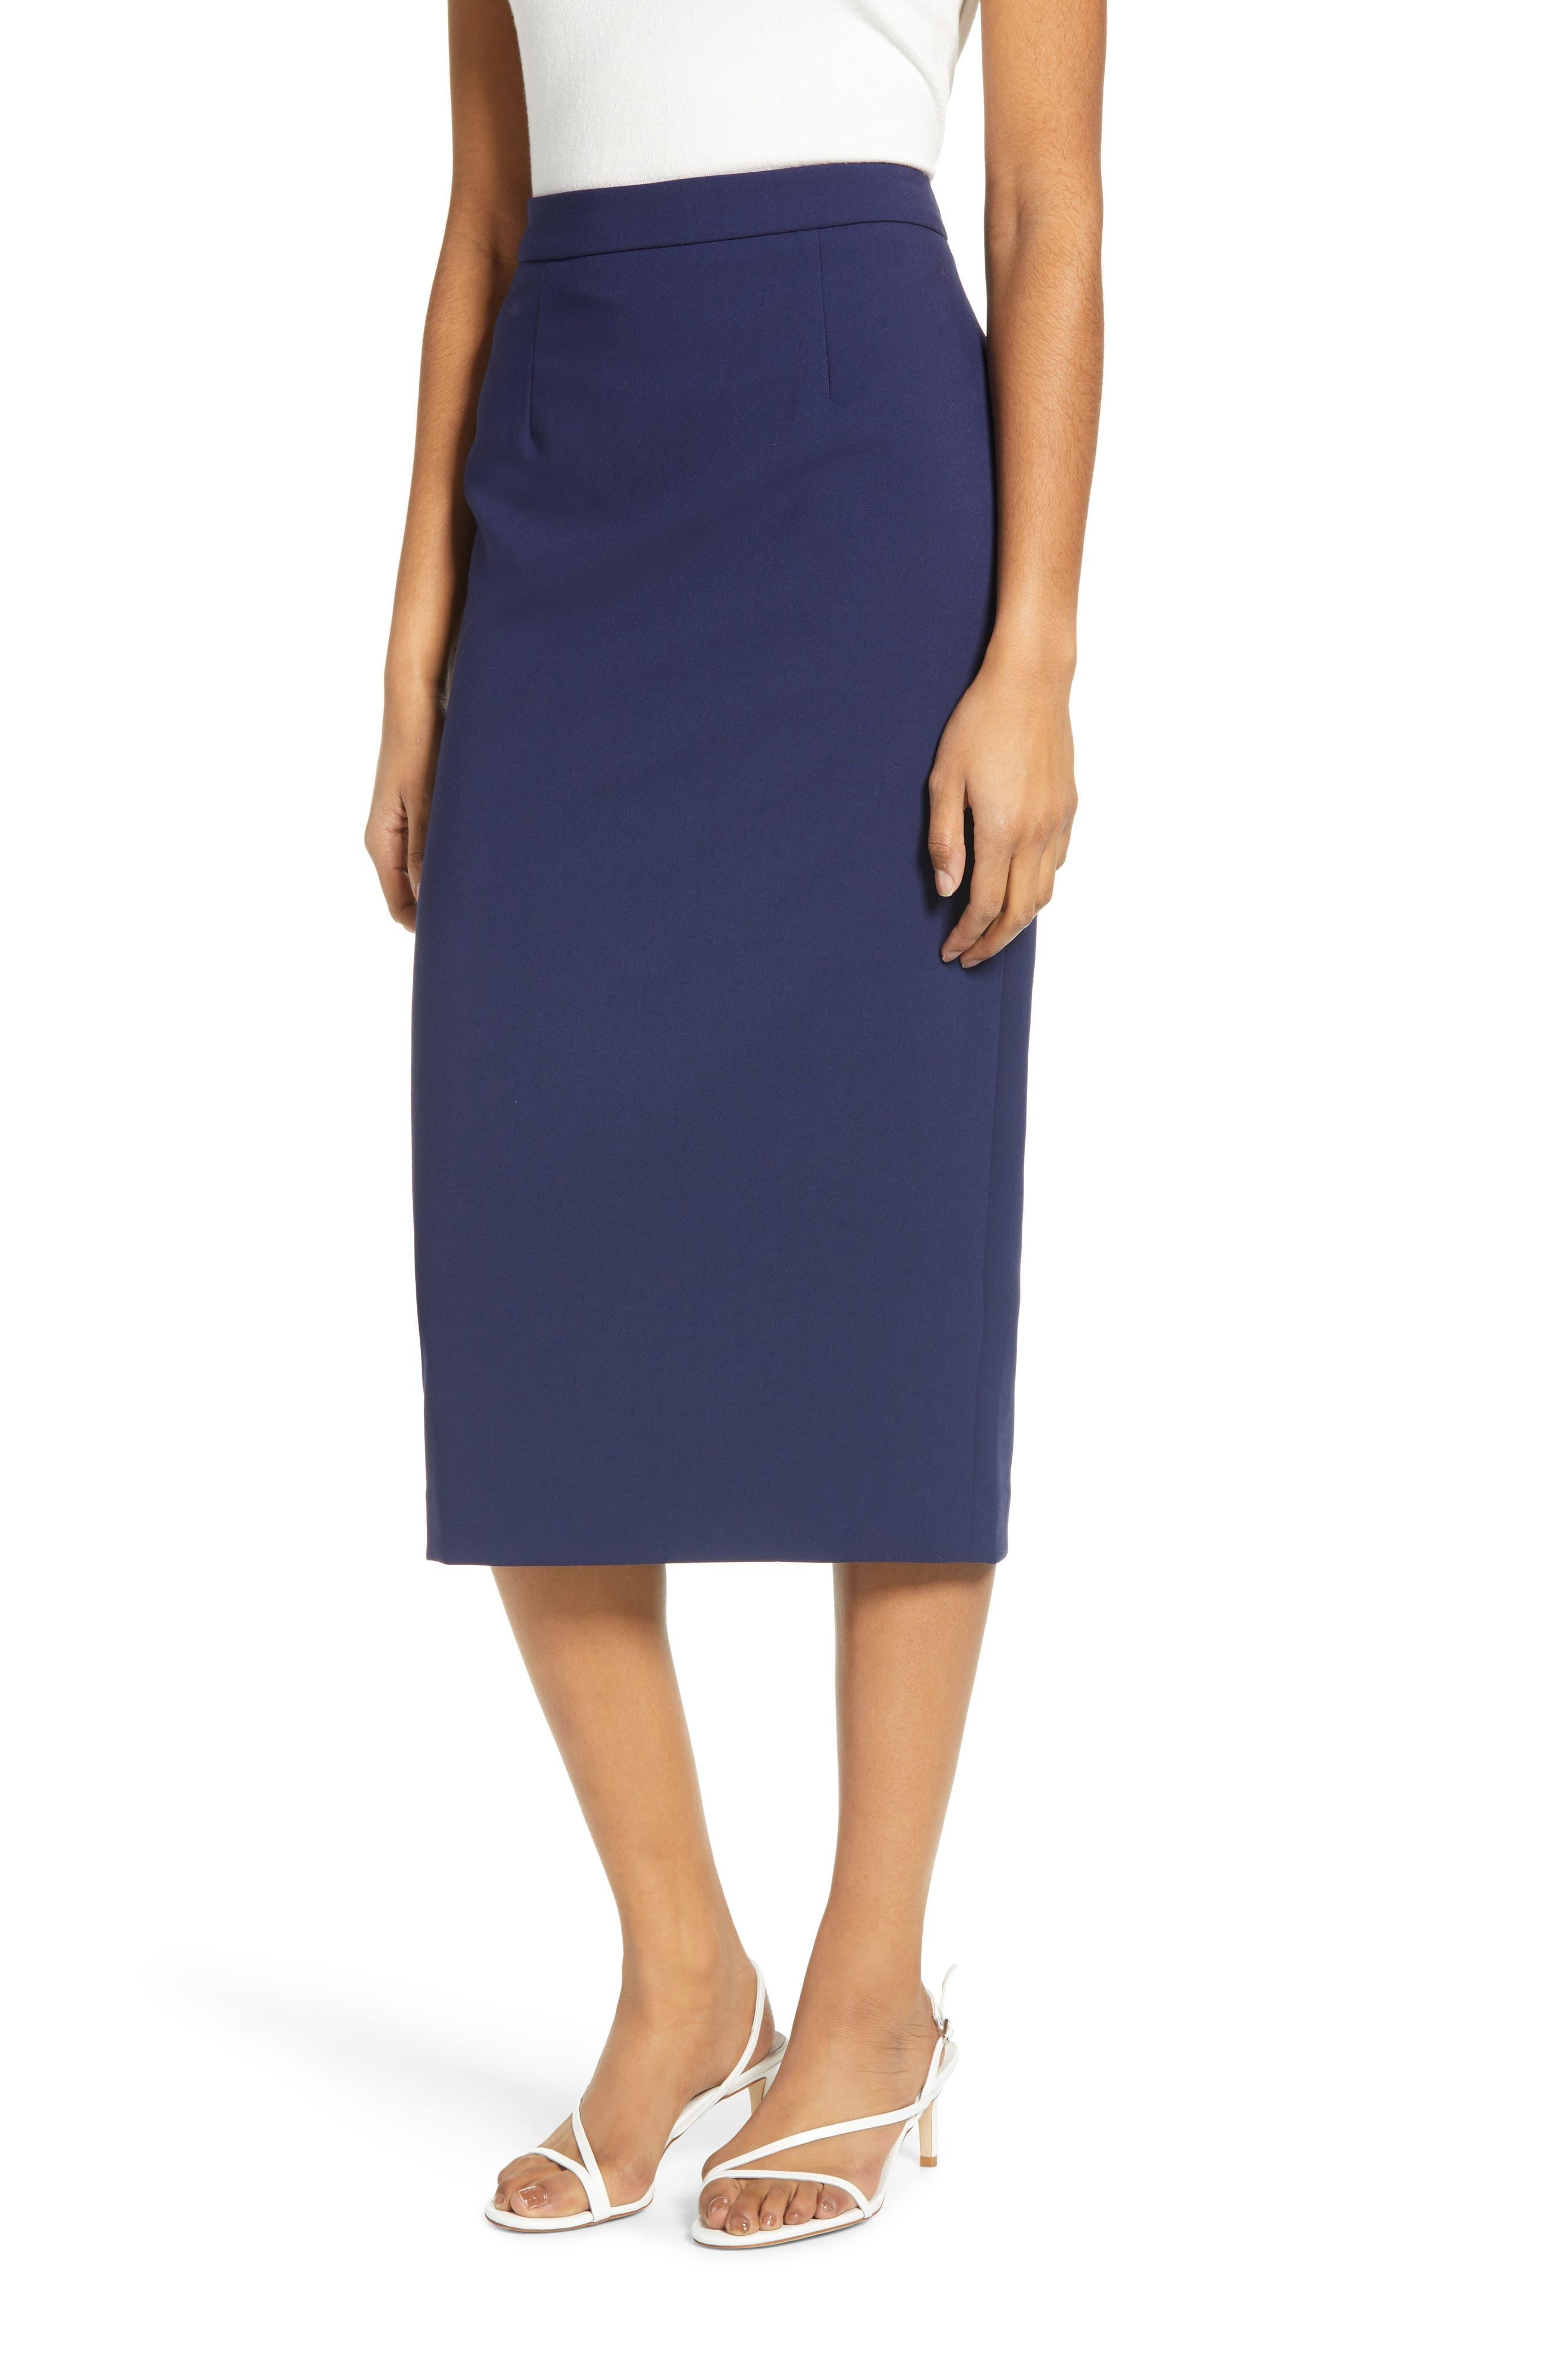 Sandro Womens Skirt Size 1 Navy Blue Floral Straight Knee Length Silk Casual